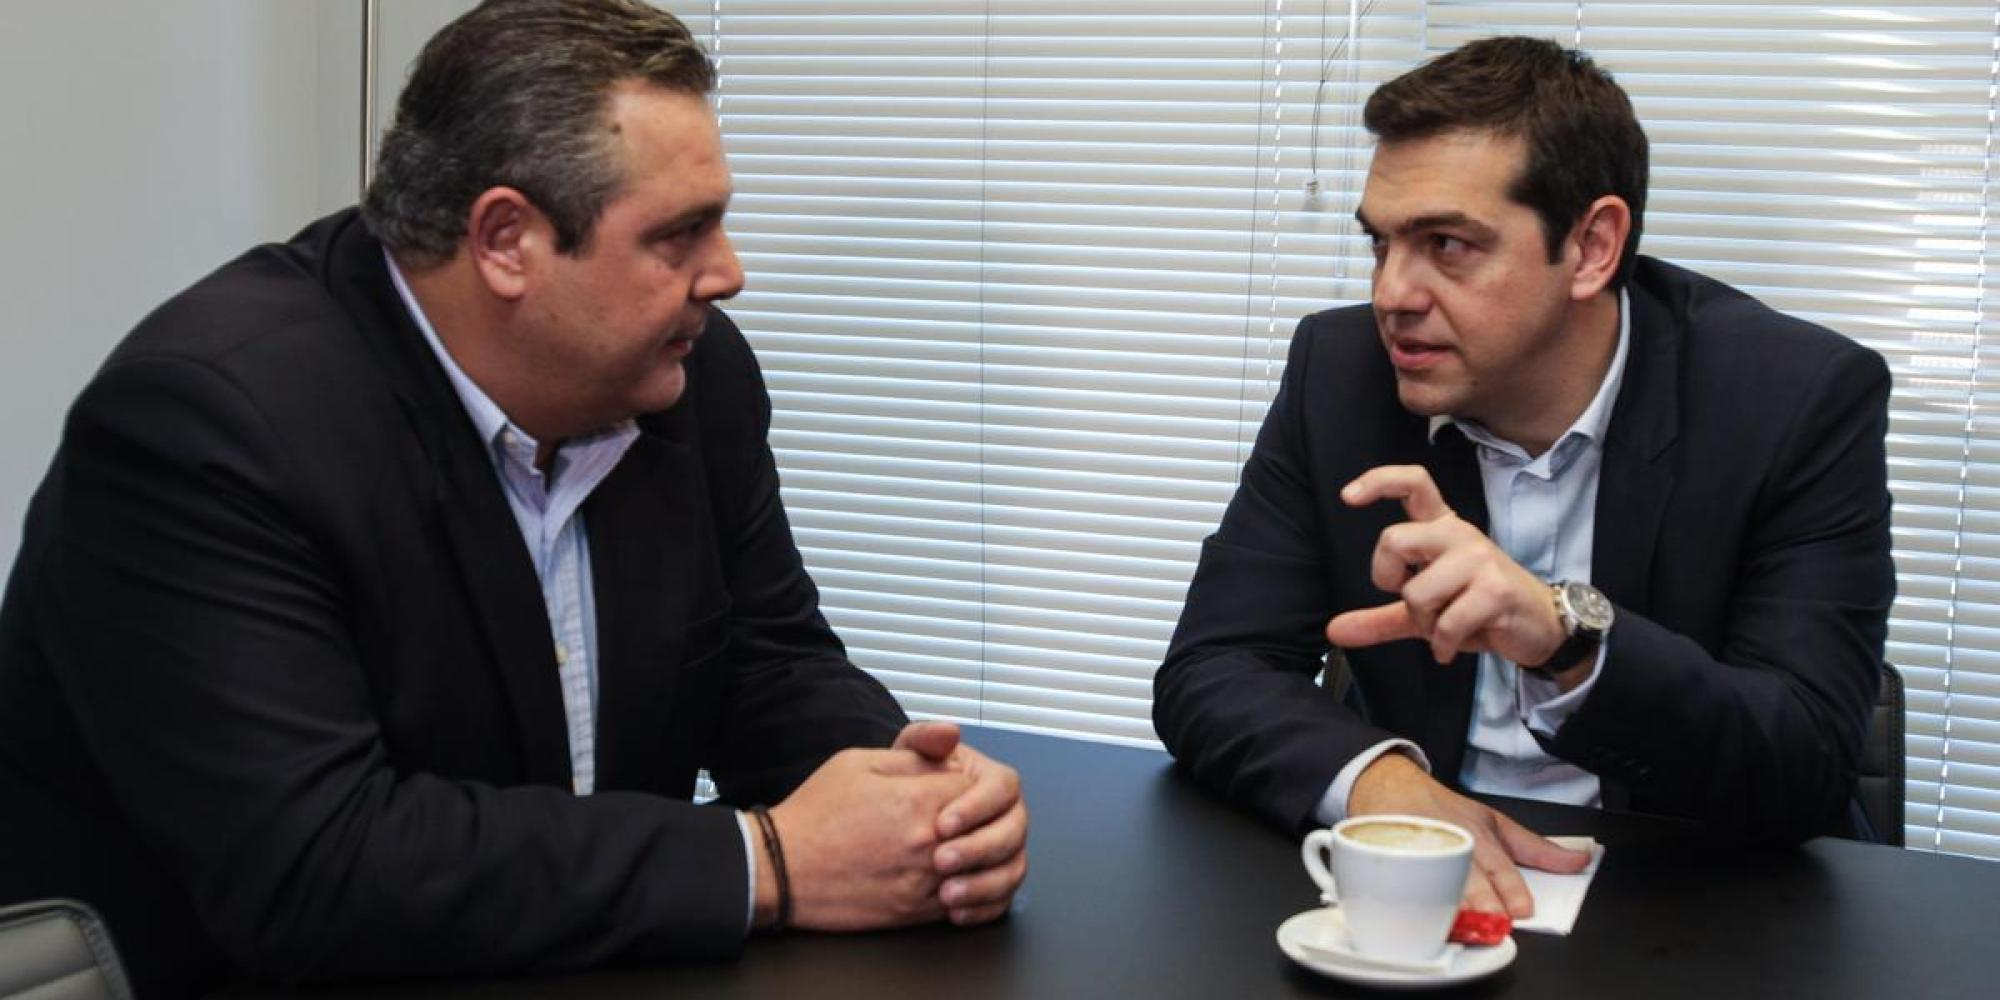 Ramifications of fYROMacedonia name-change deal heap pressure on Greek coalition